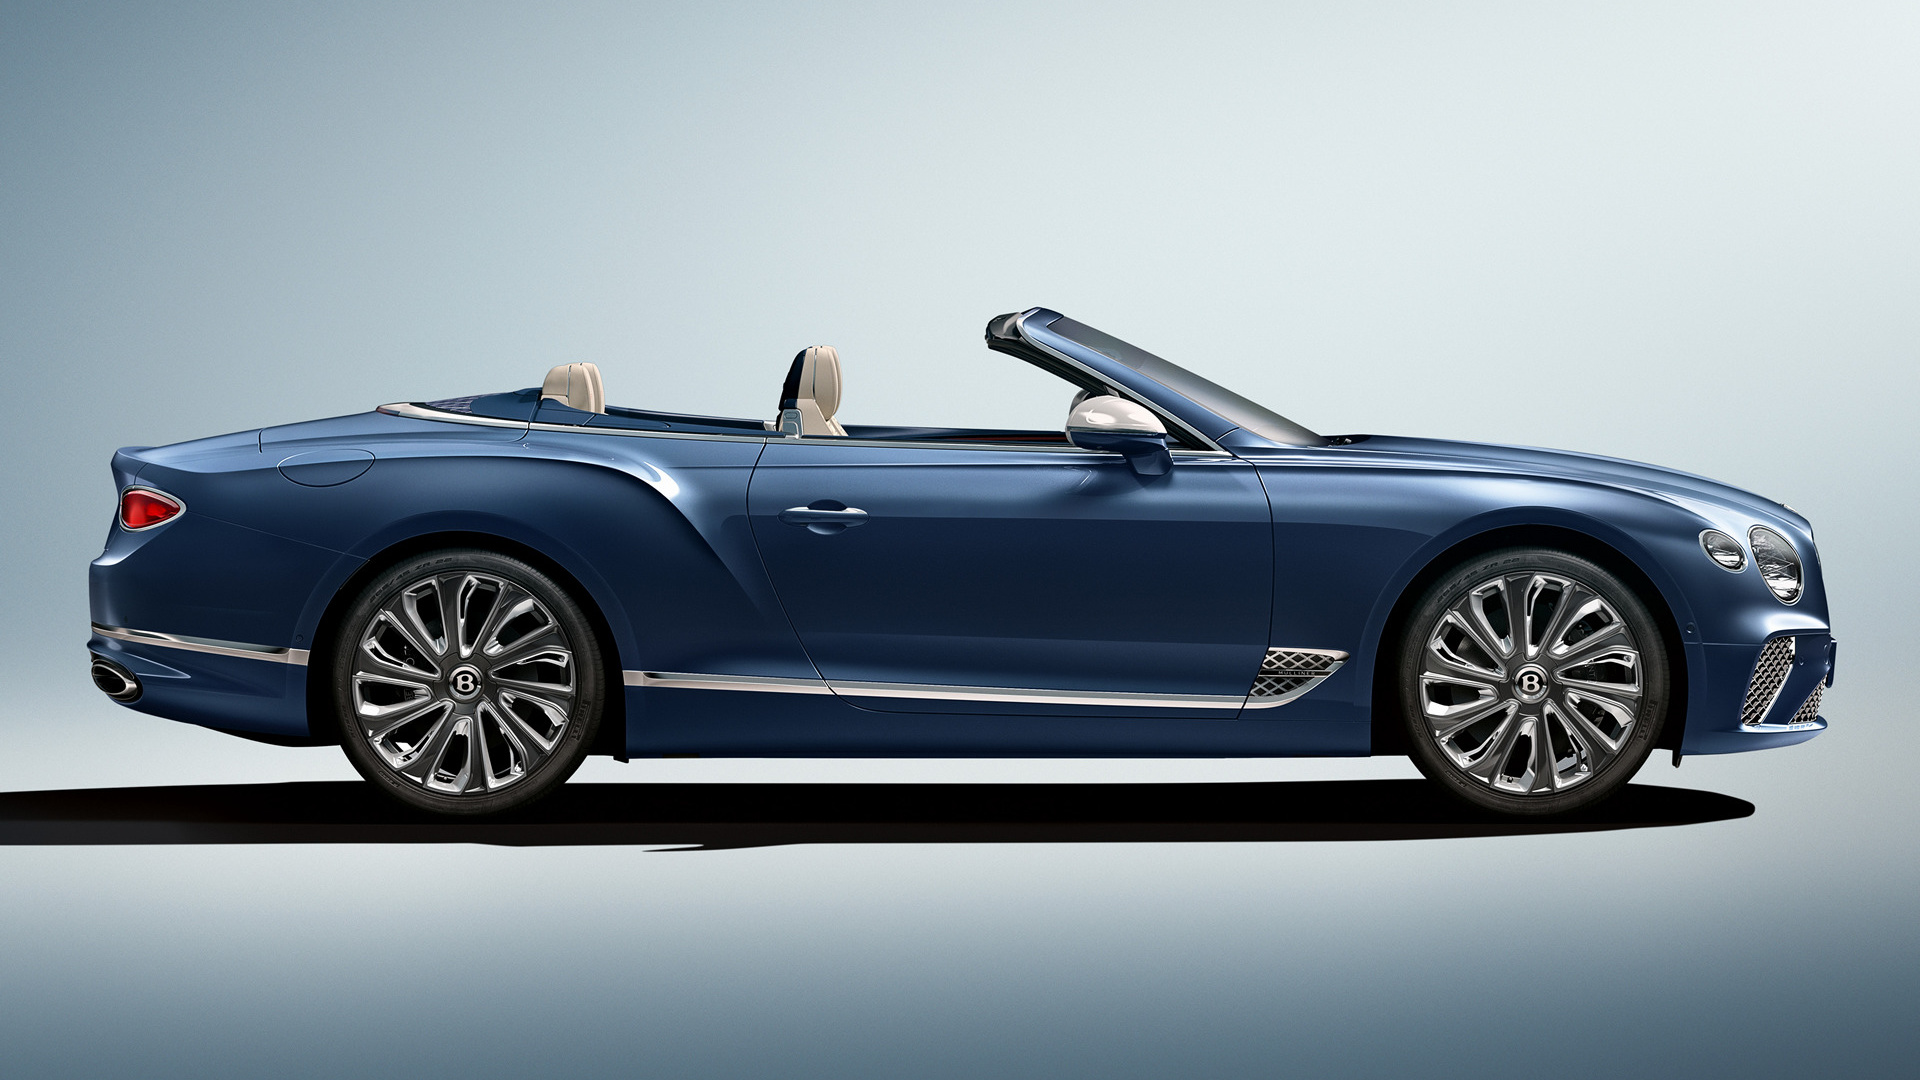 2020 Bentley Continental Gt Convertible By Mulliner Papel De Parede Hd Plano De Fundo 1920x1080 Id 1069519 Wallpaper Abyss